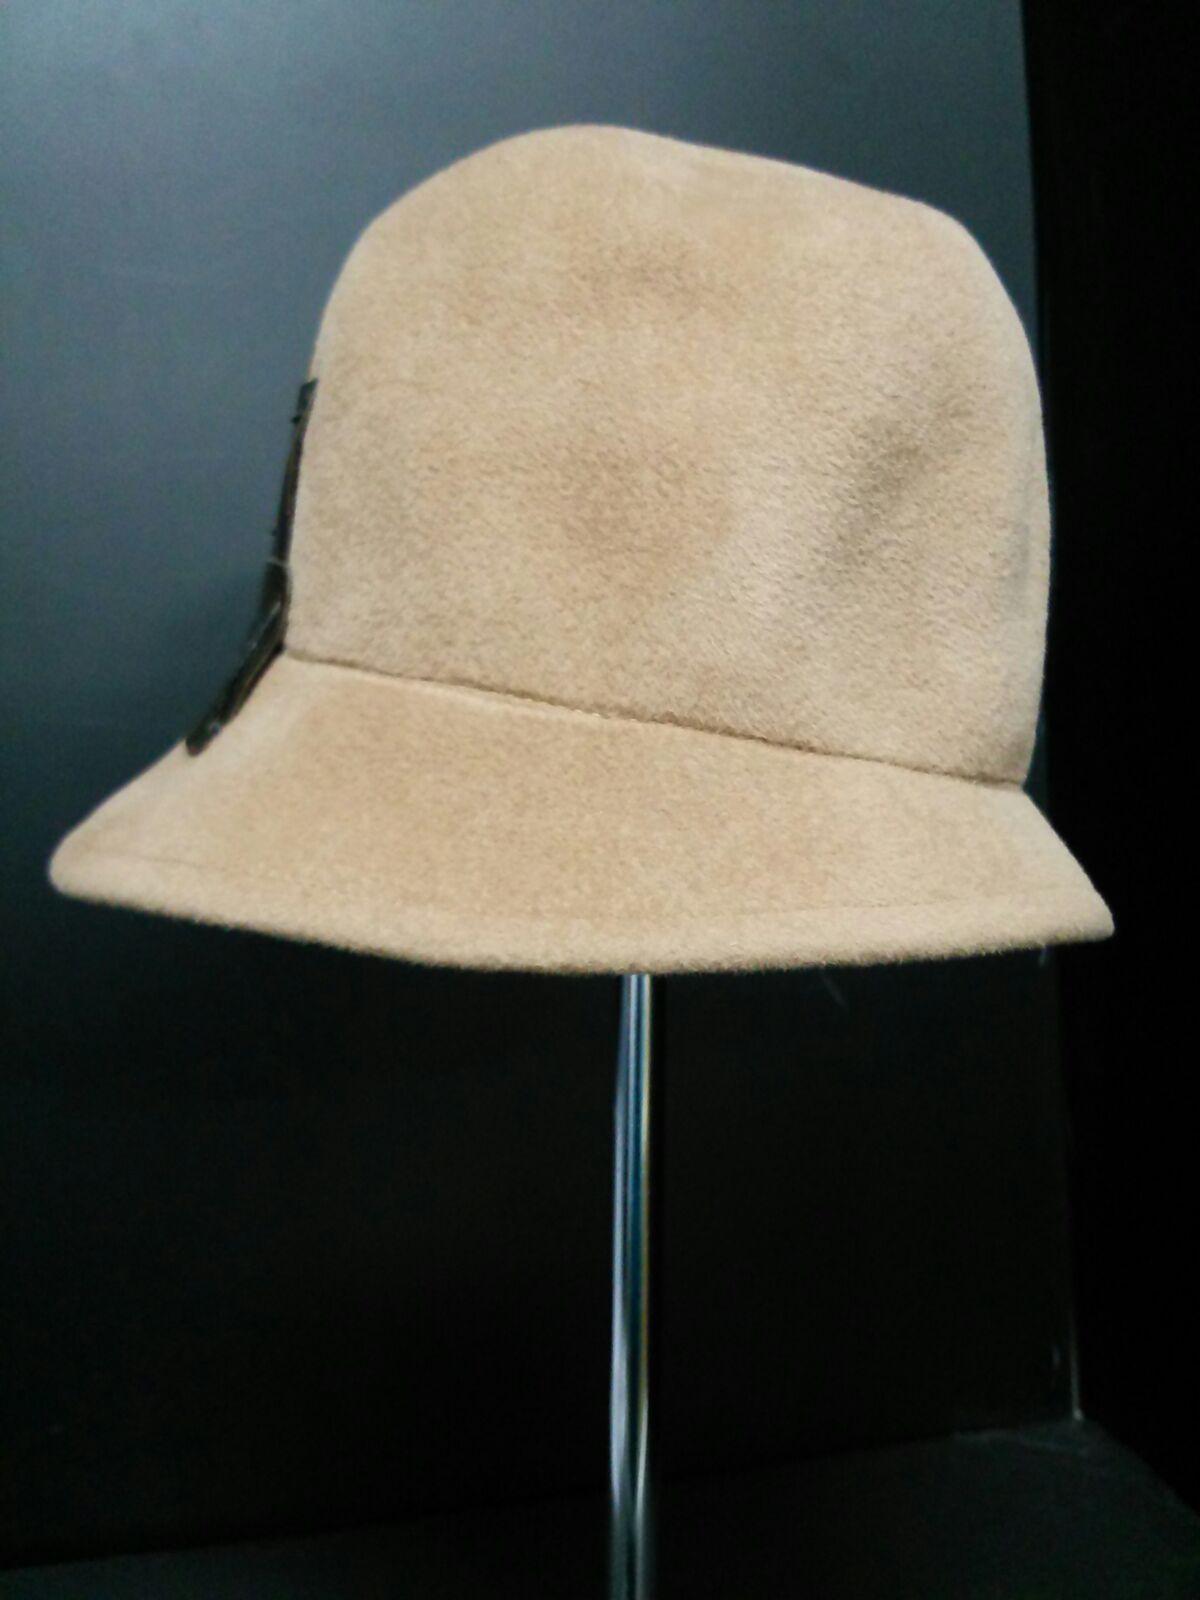 Lola(ローラ)の帽子